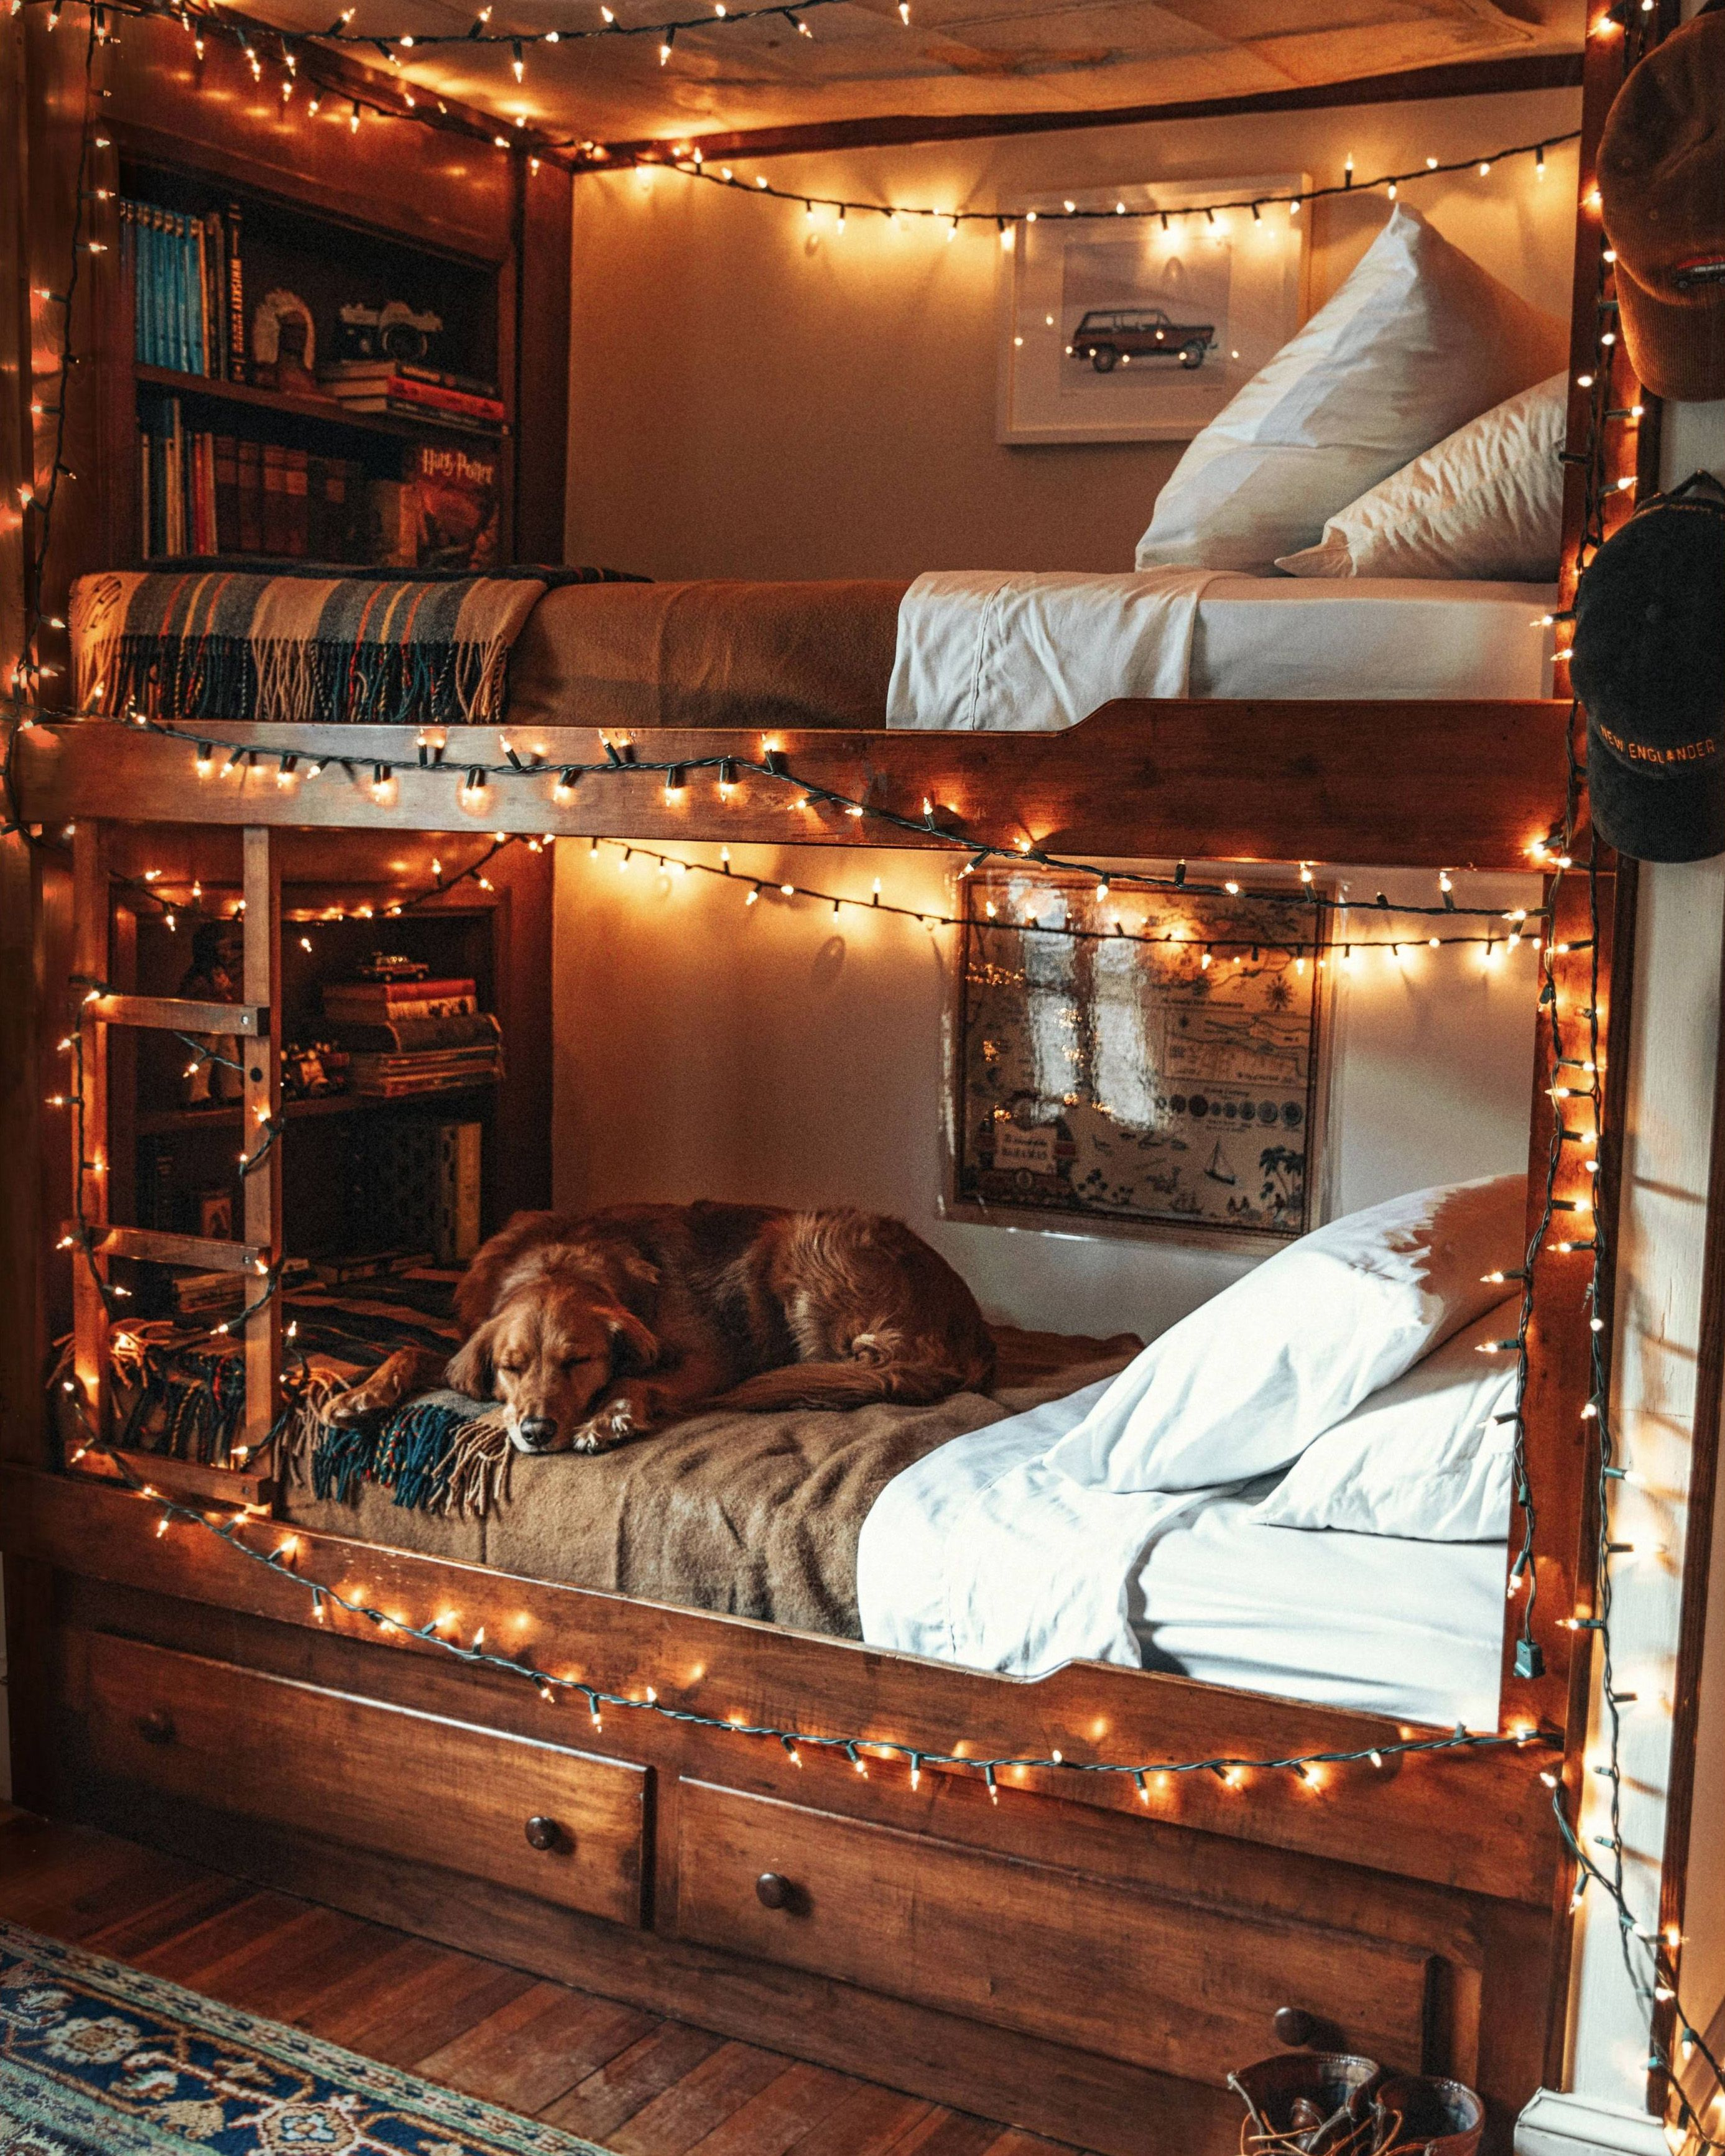 Warm And Cozy Bunk Bed Hippie Bedroom Design Bunk Bed Decor Bedroom Design On A Budget